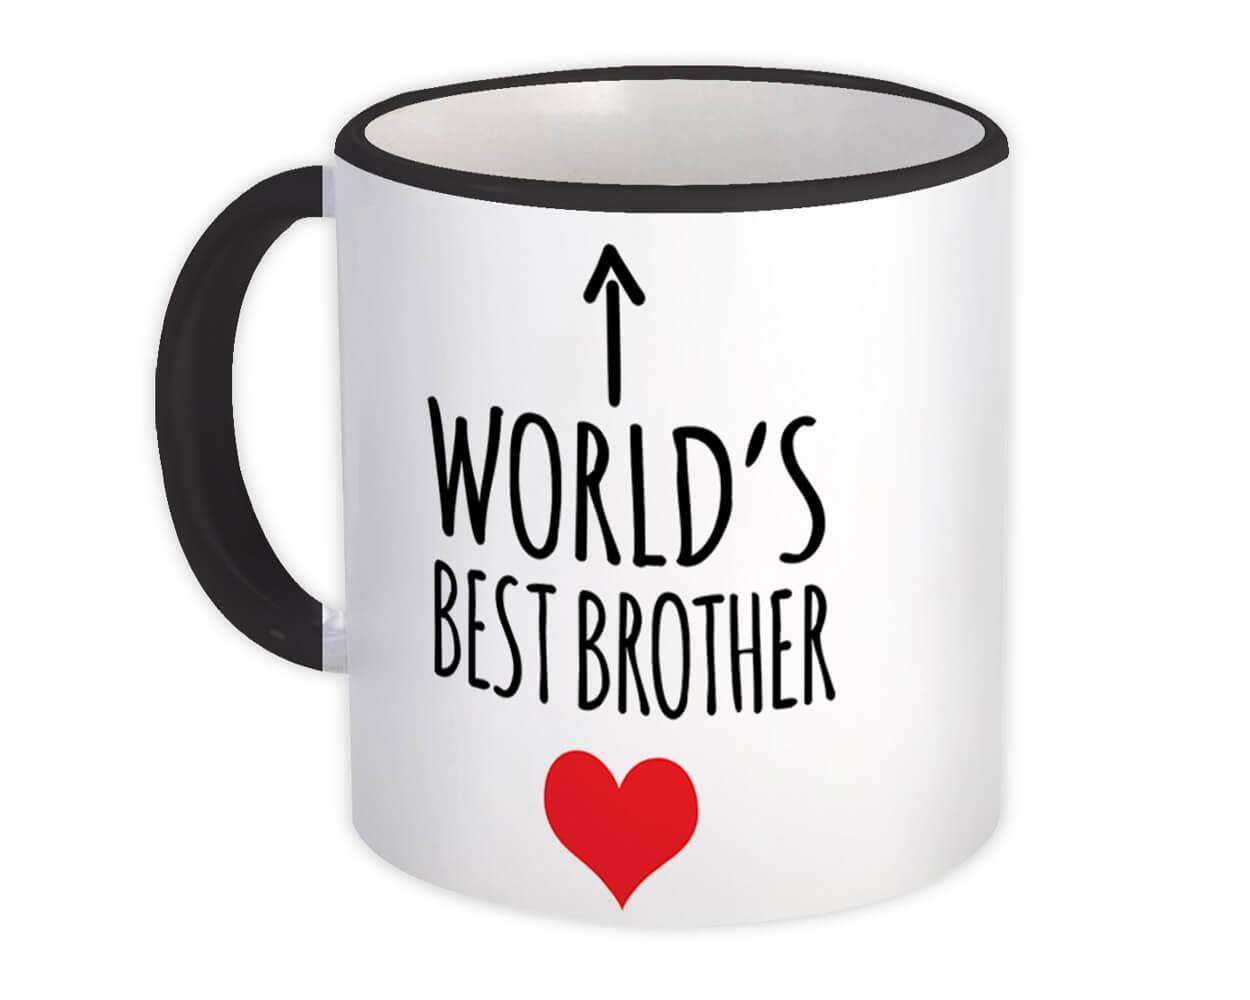 Worlds Best BROTHER : Gift Mug Heart Love Family Work Christmas Birthday